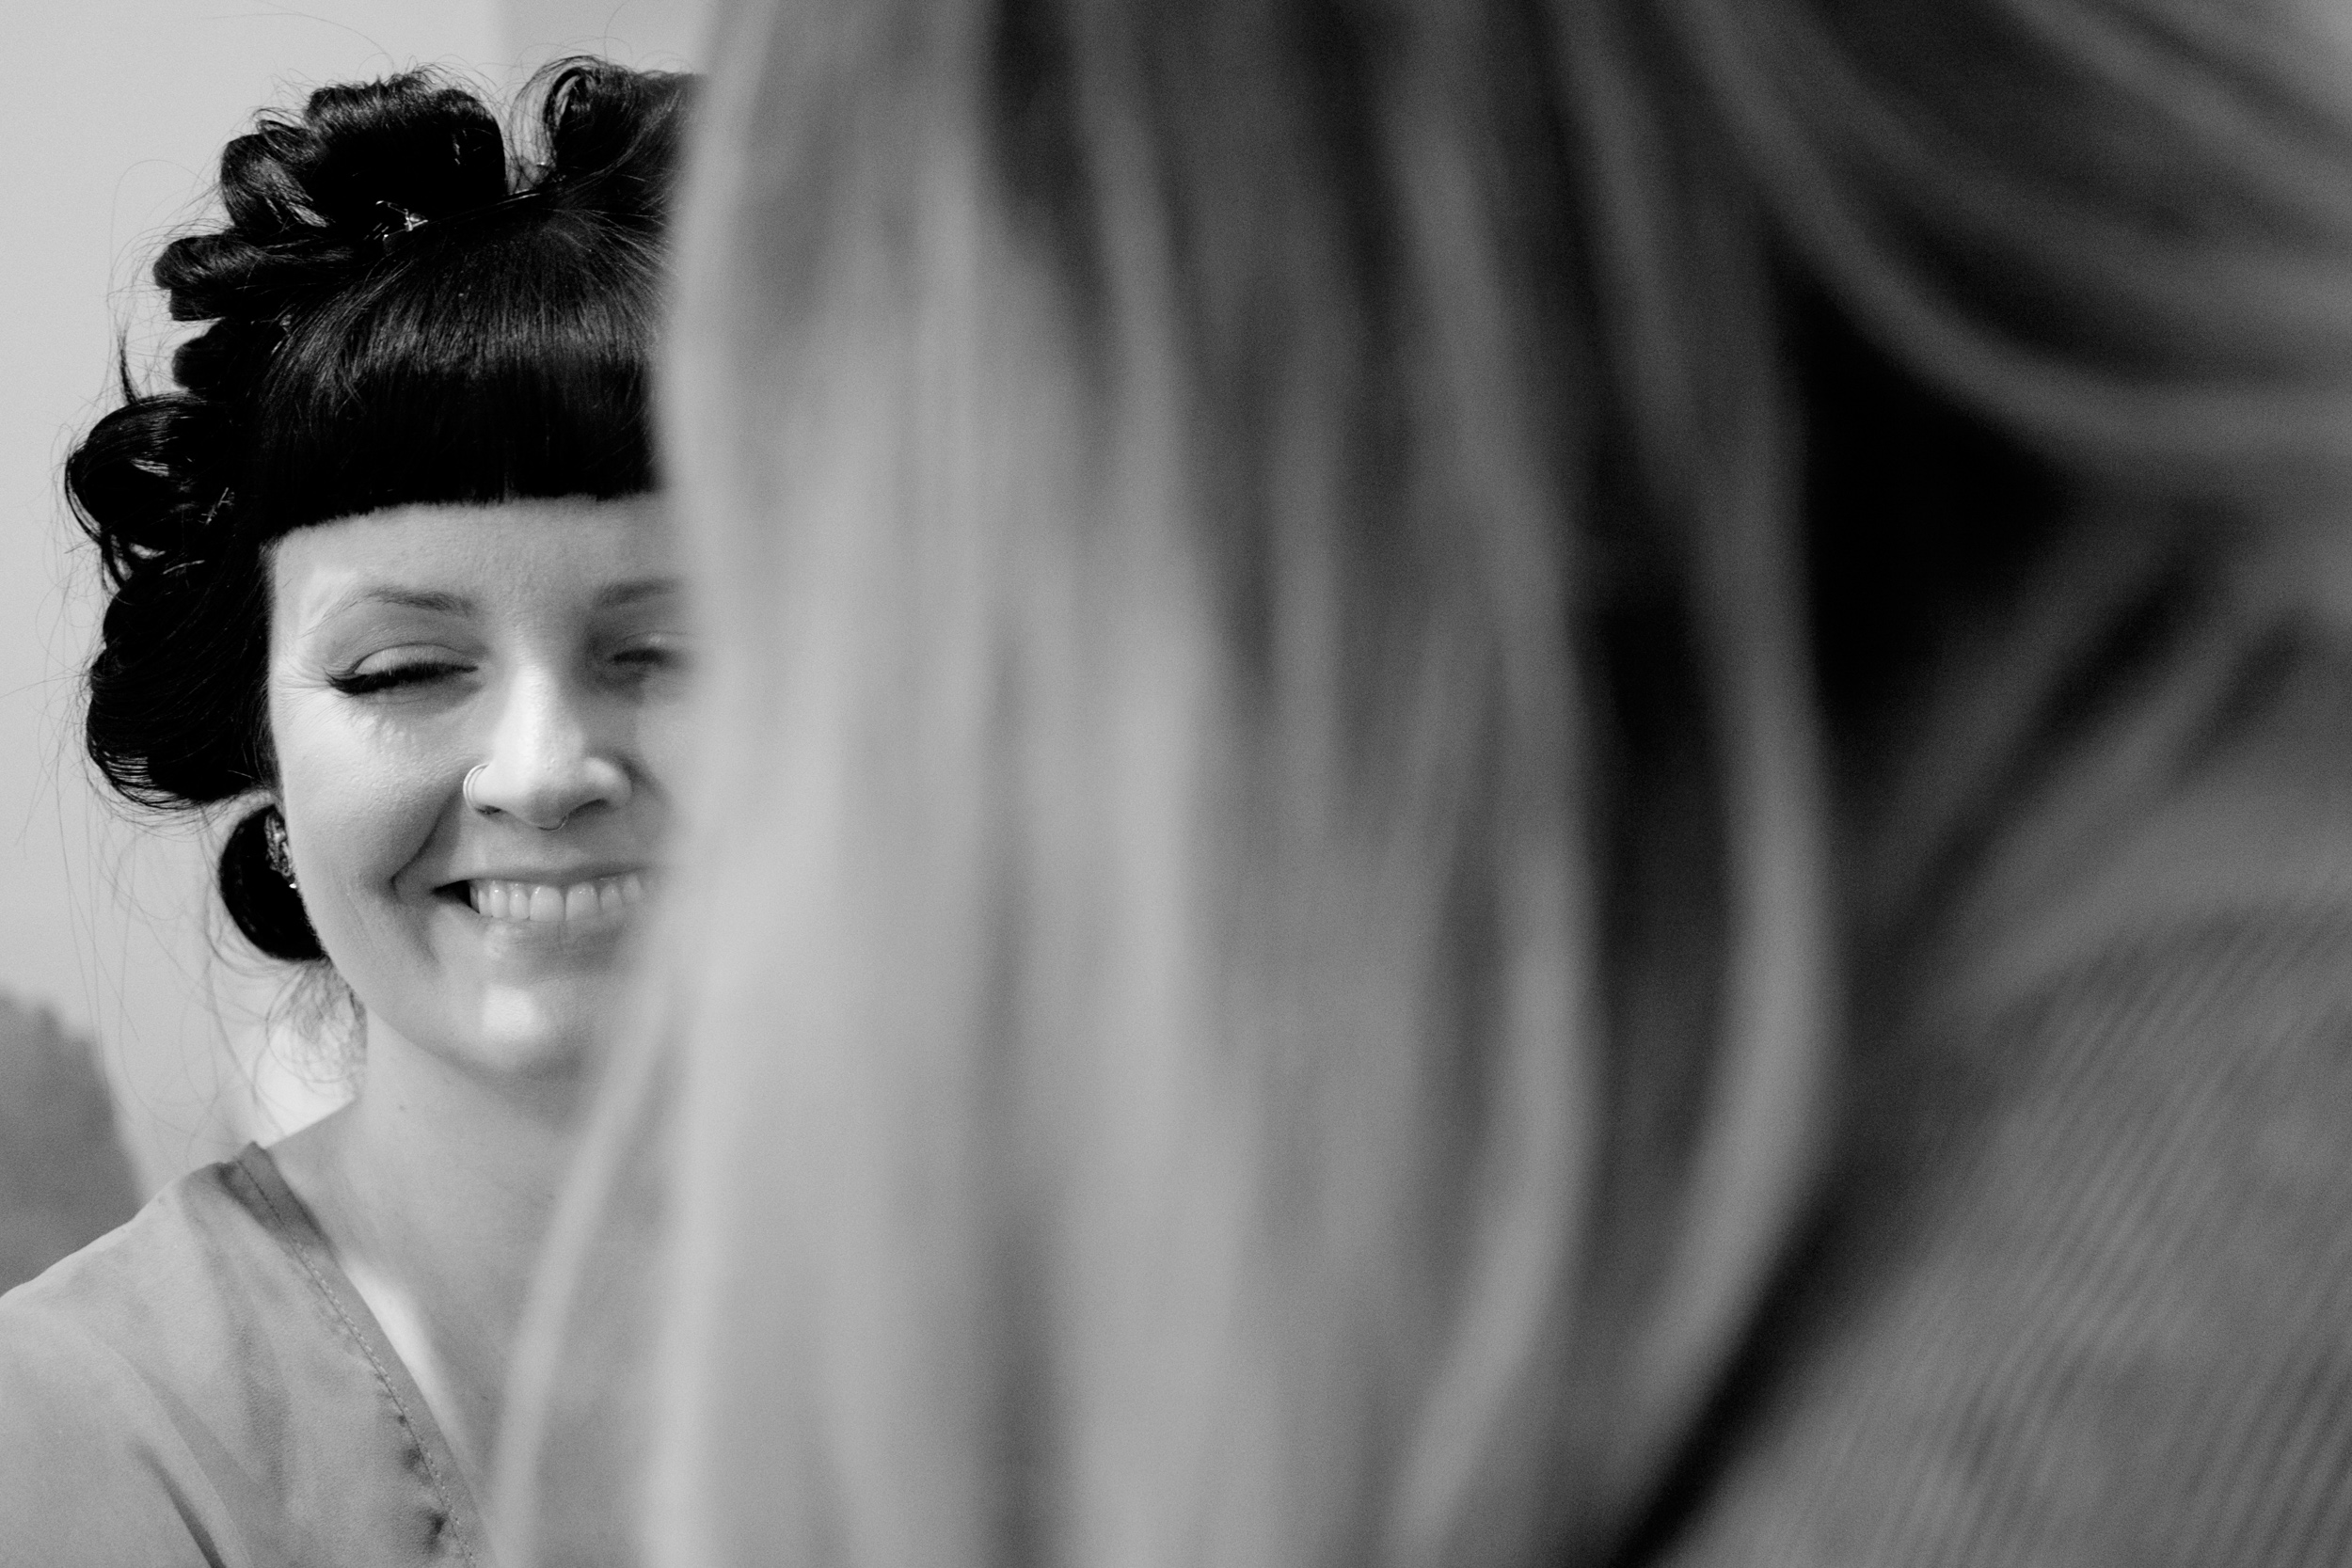 Christian & Sarah wedding photography by Brian milo-114.jpg